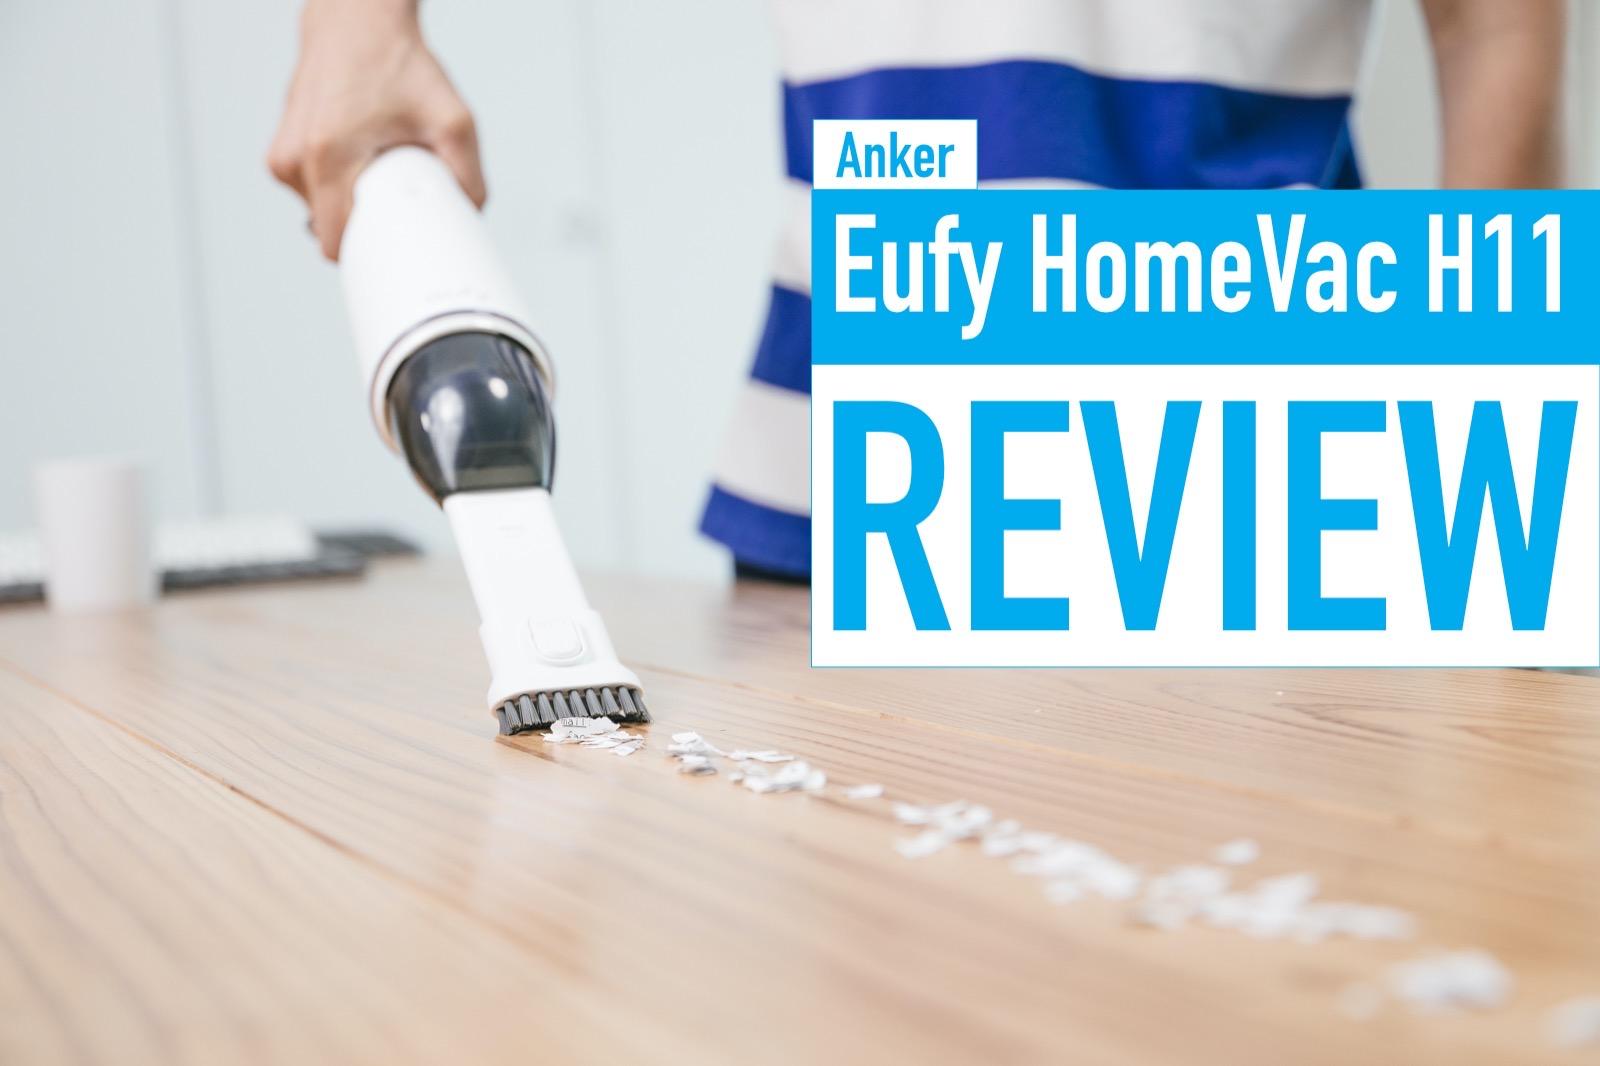 Anker Eufy HomeVac H11